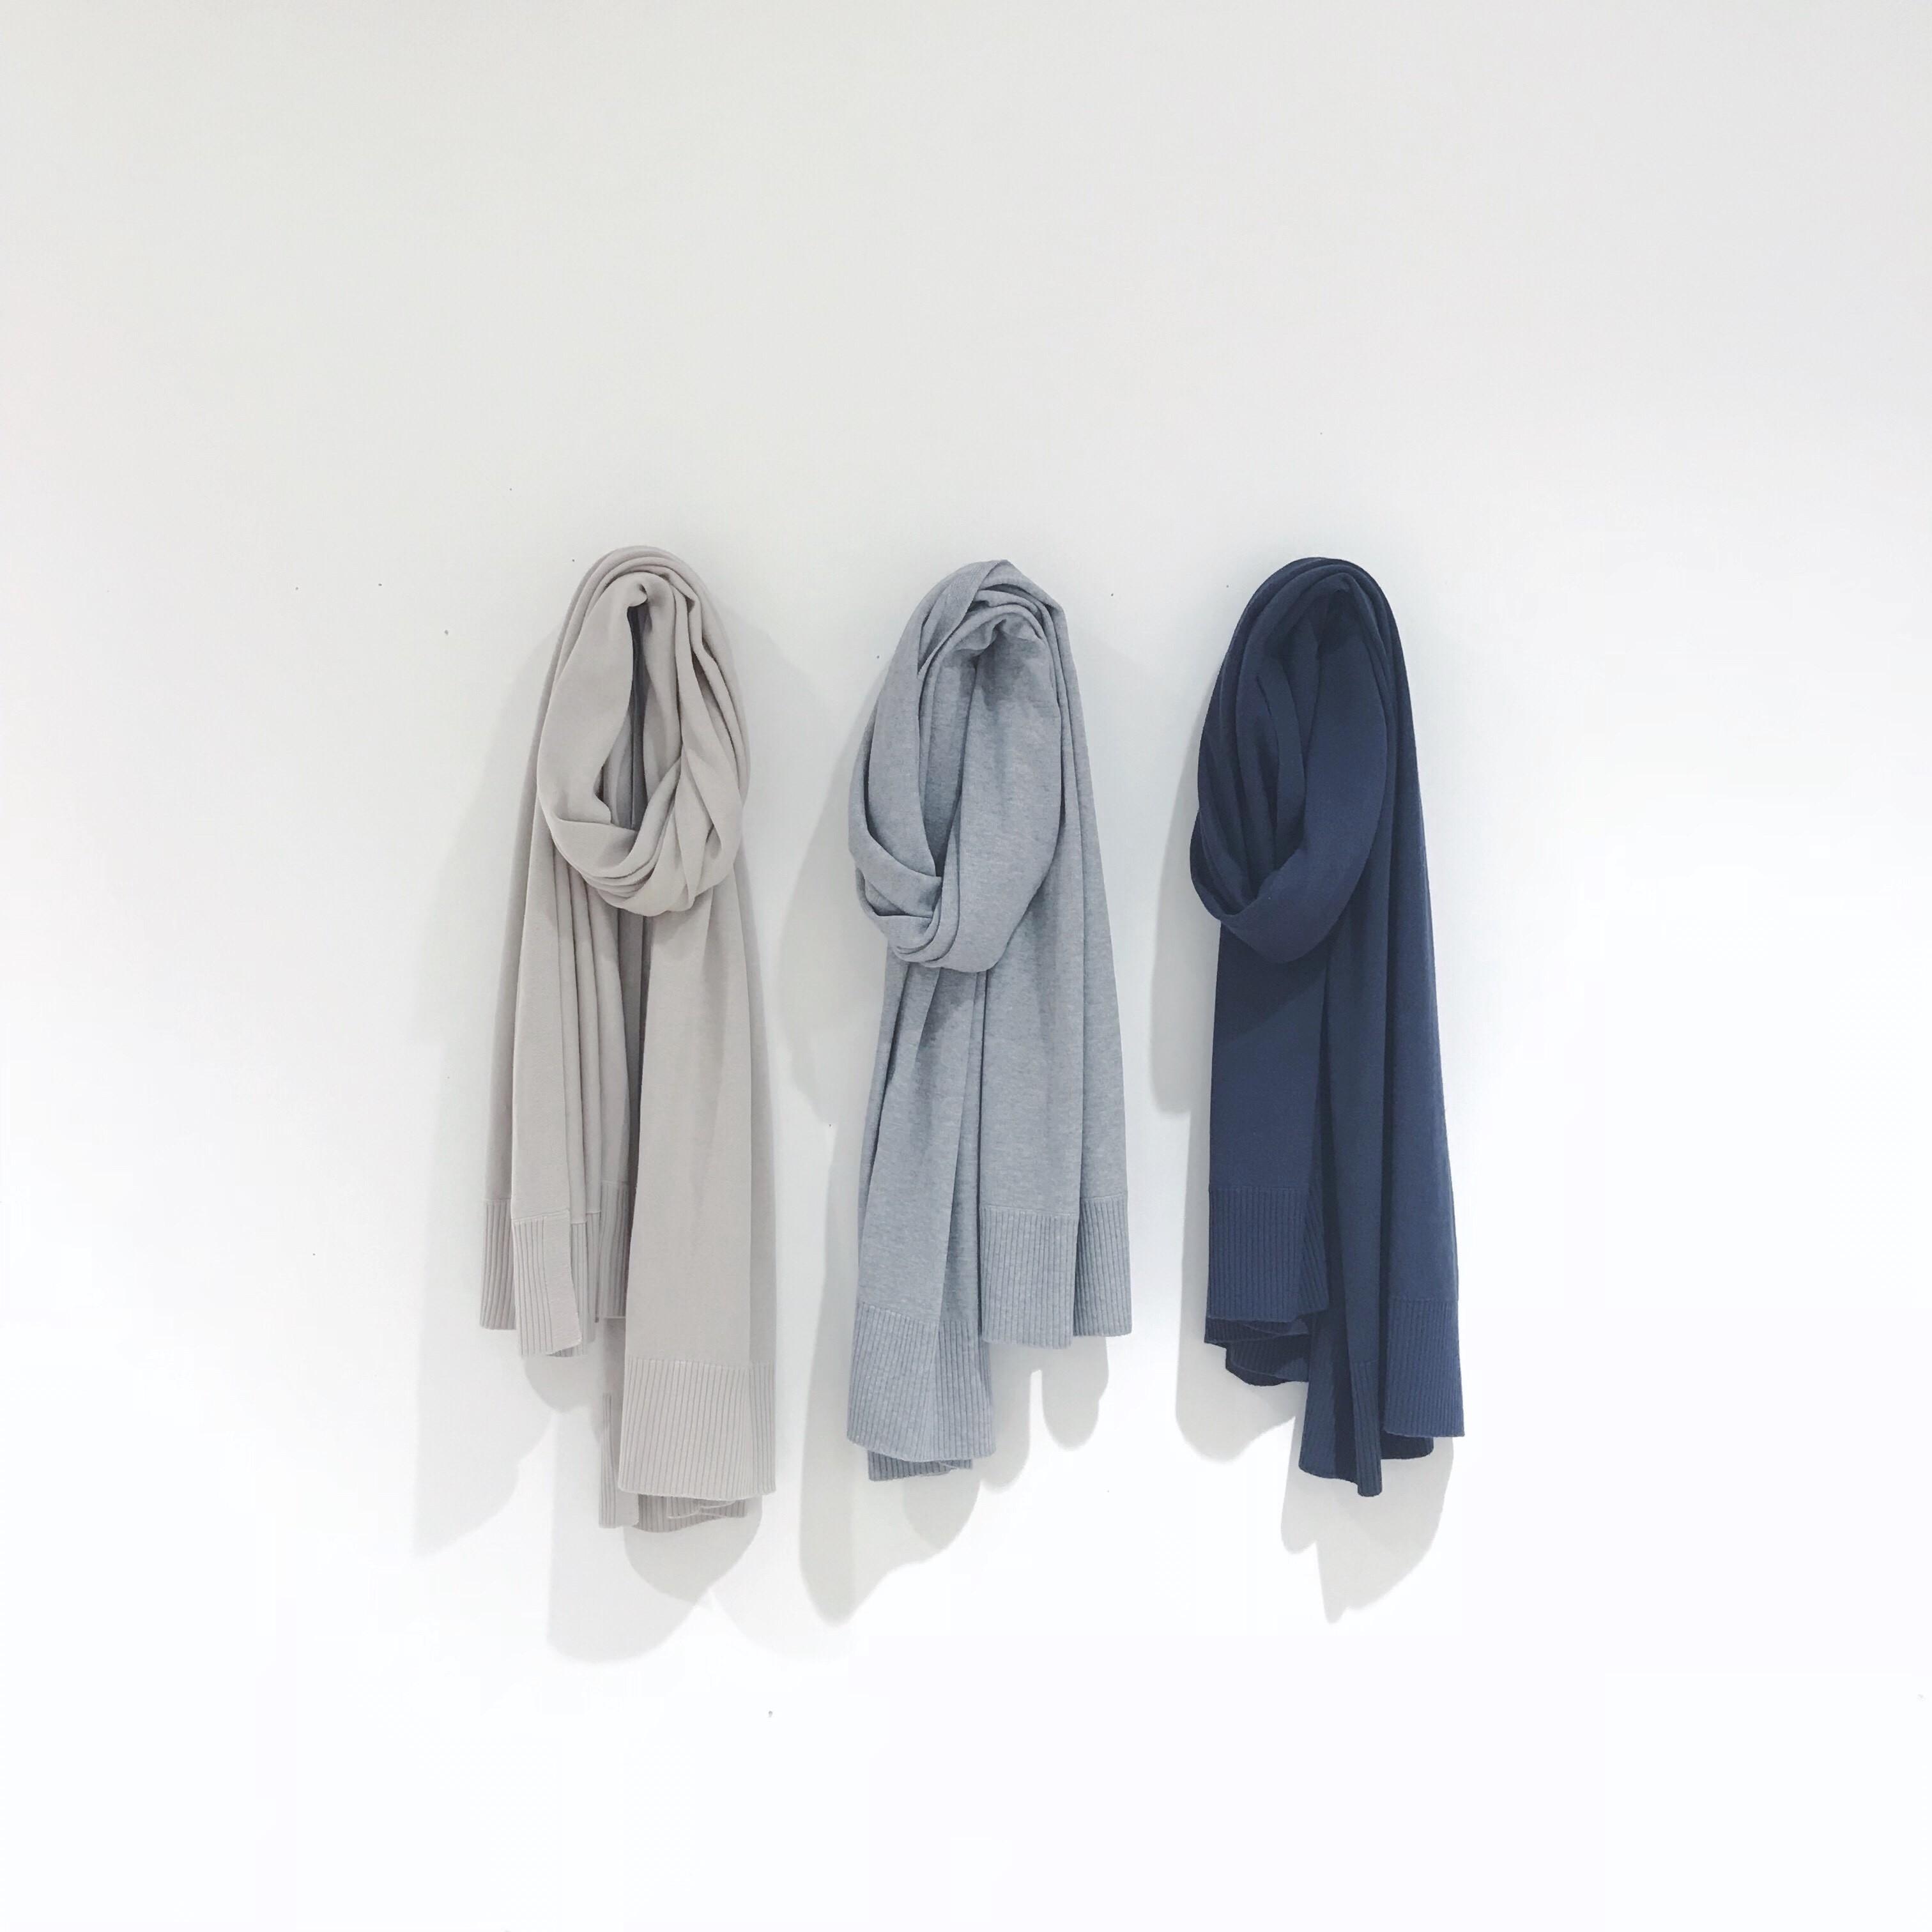 「DRESS HERSELF」のデイリーウェア